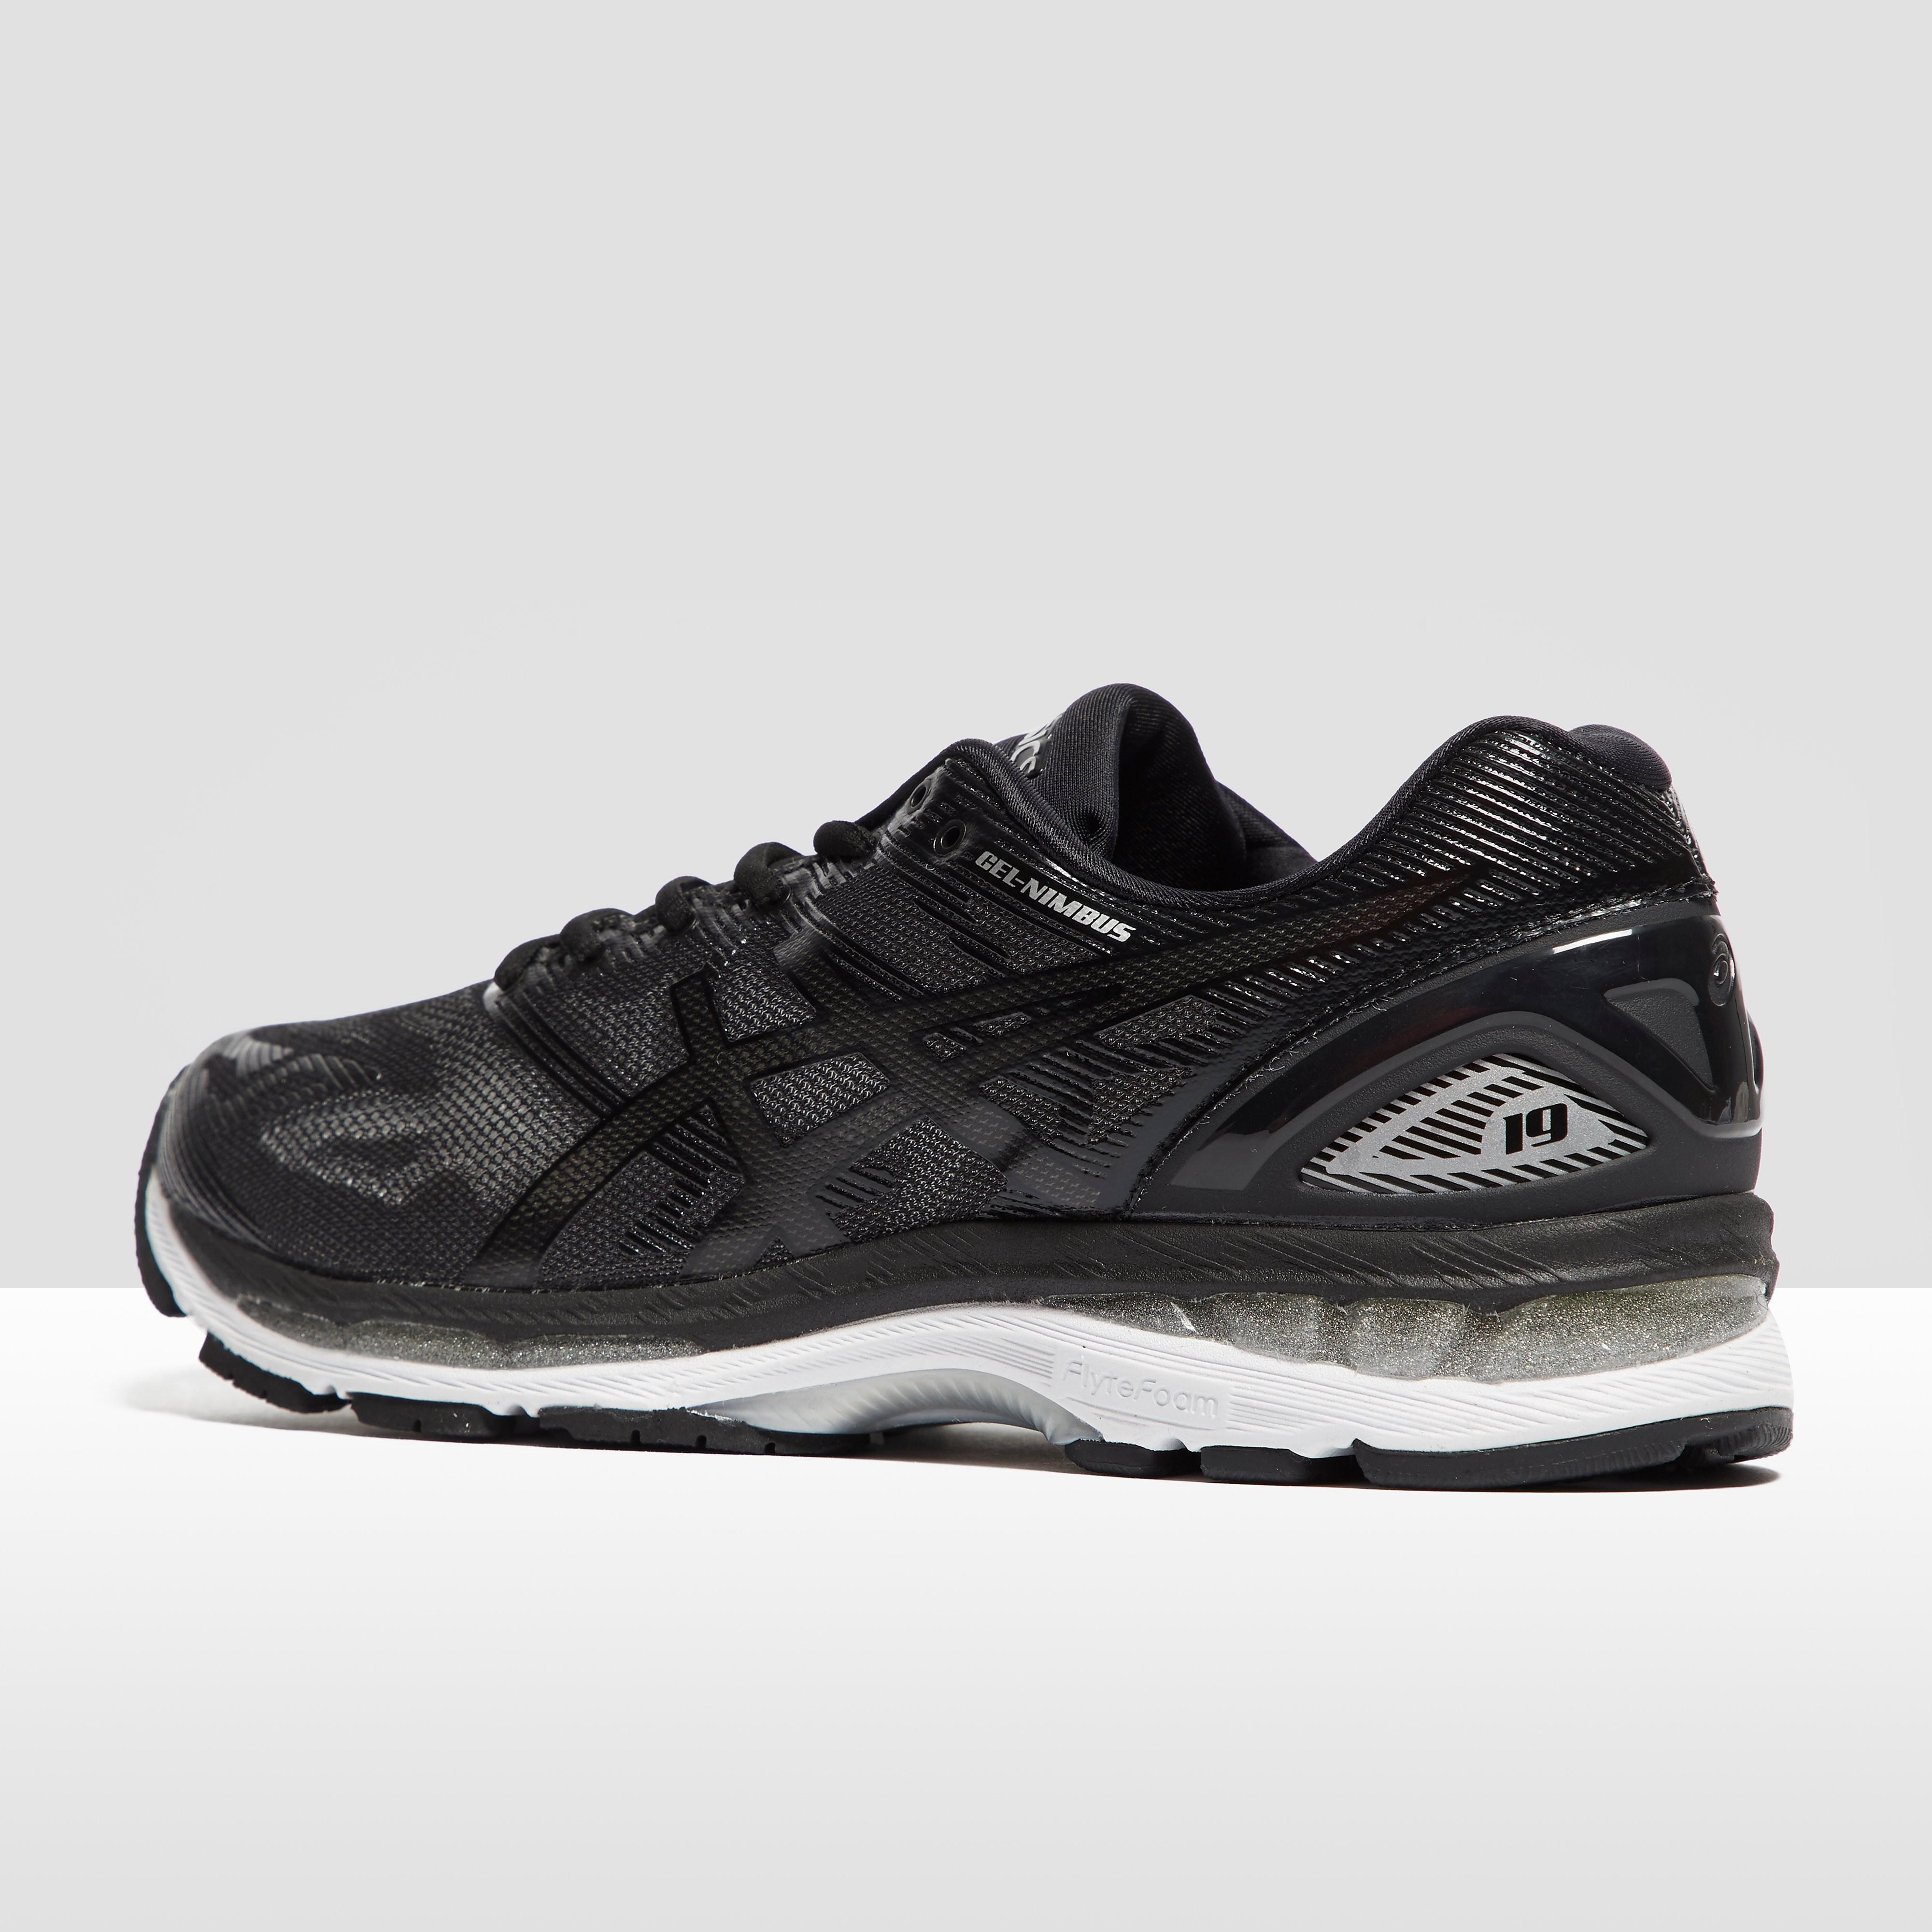 ASICS Gel-Nimbus 19 Men's Running Shoes